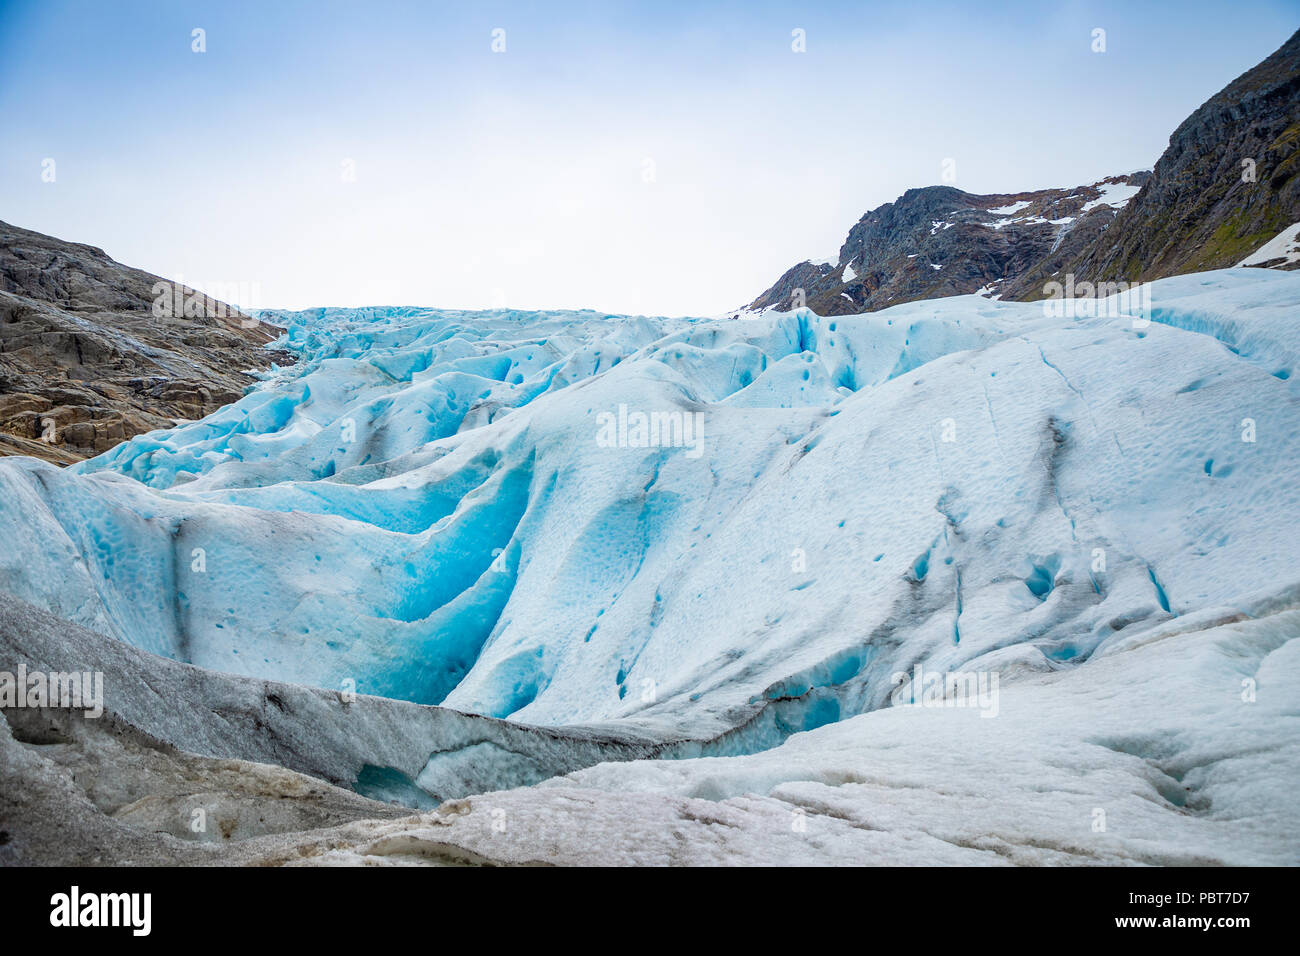 Partie de Glacier Svartisen en Norvège Photo Stock